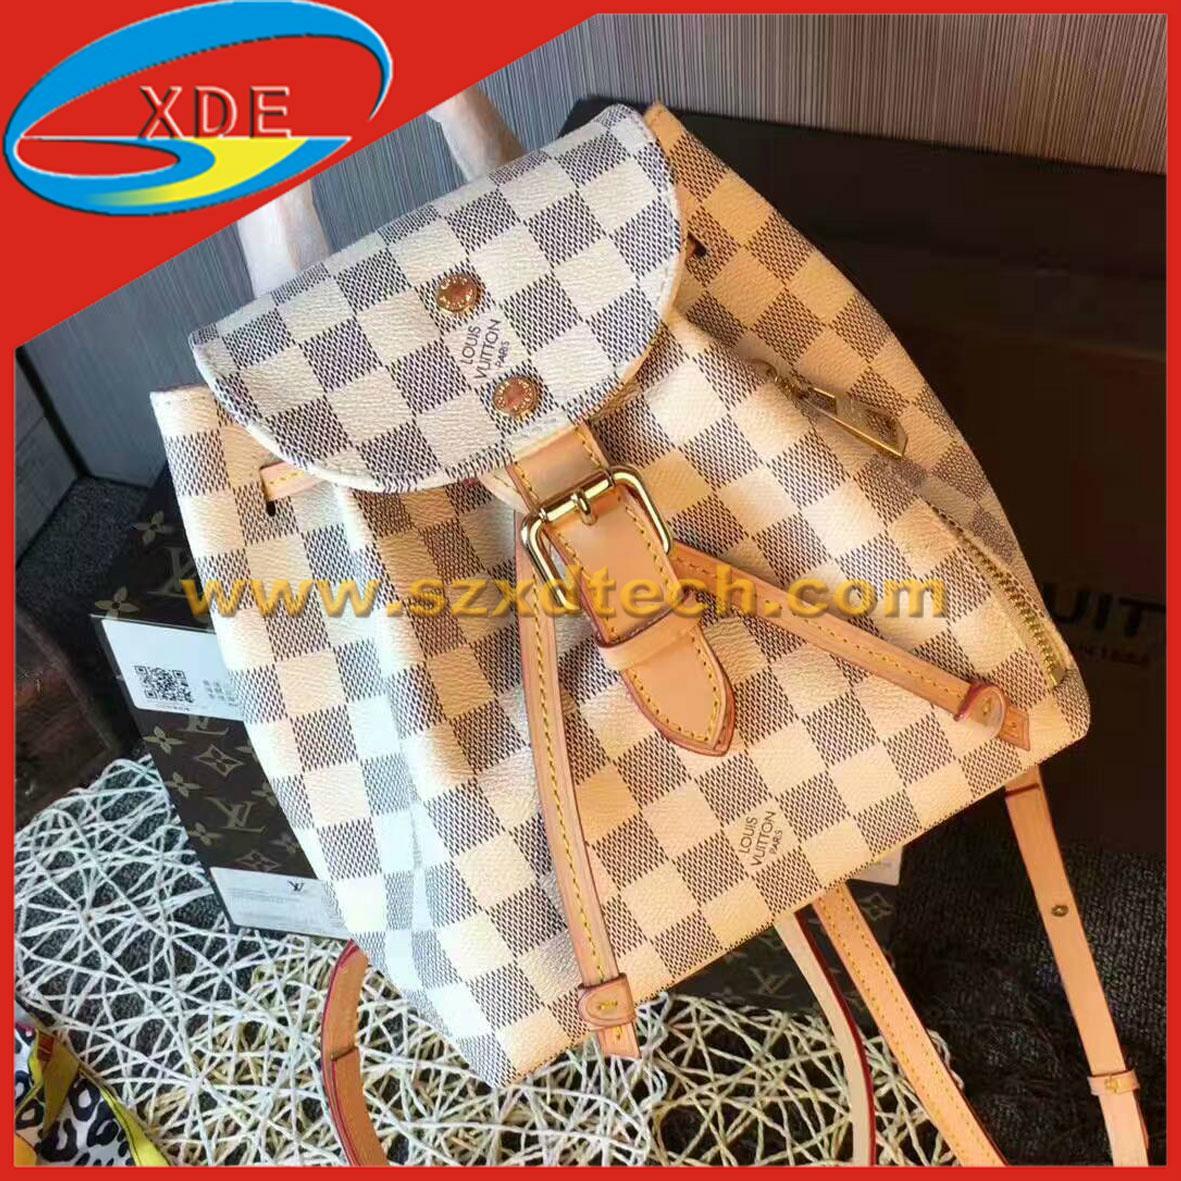 Louis Vuitton Sperone Damier Azur Canvas Handbags LV Backpacks LV Bags 1